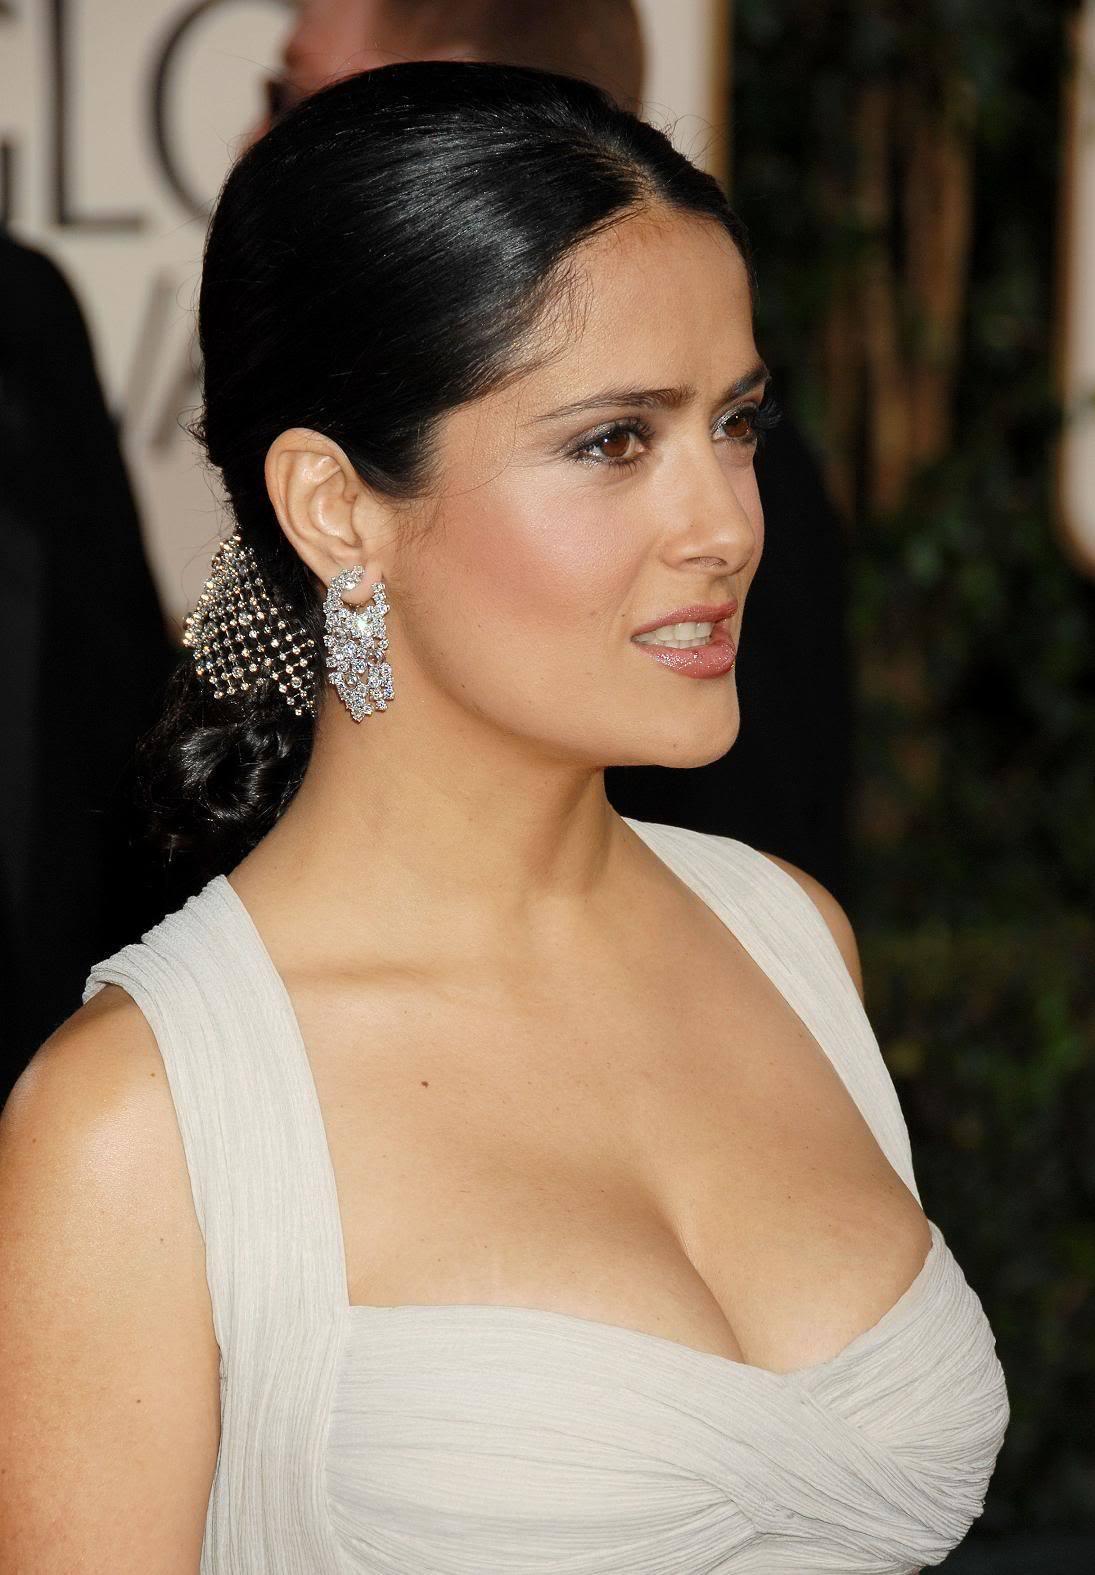 Salma Hayek at the Golden Globe Awards - Sexy Actress Pictures | Hot Actress Pictures - ActressSnaps.com